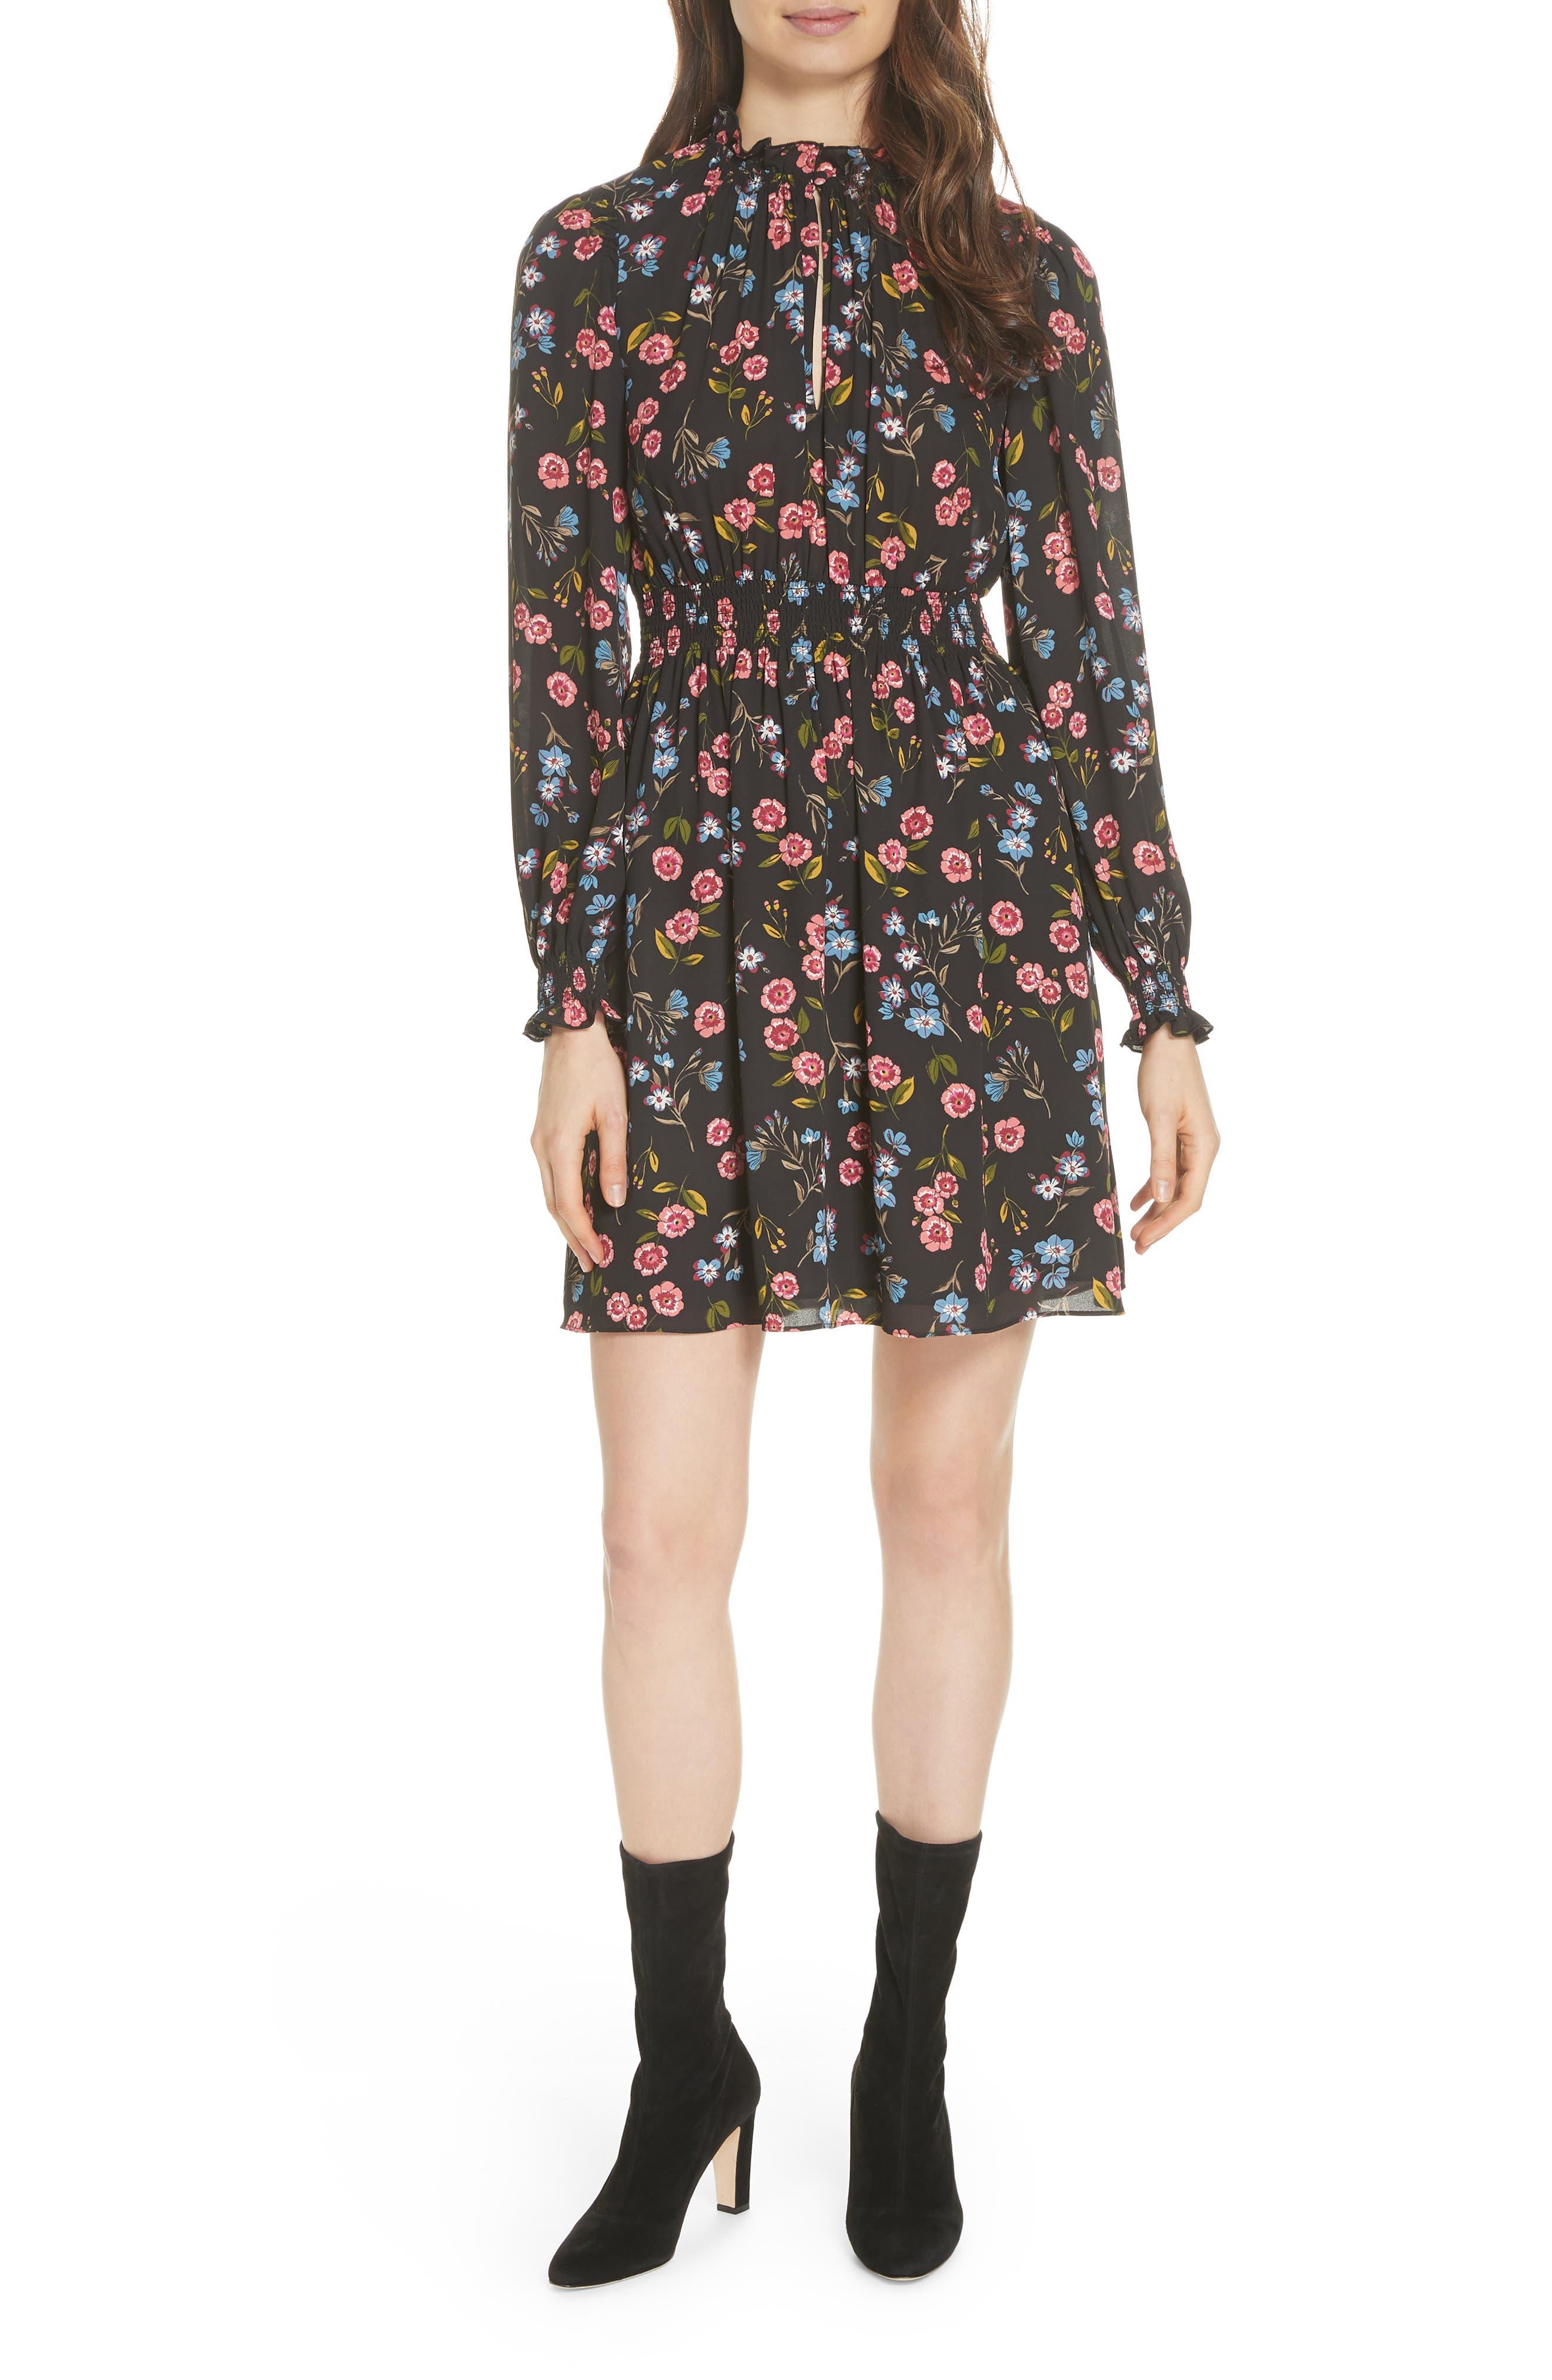 Kate Spade New York Meadow Floral Dress